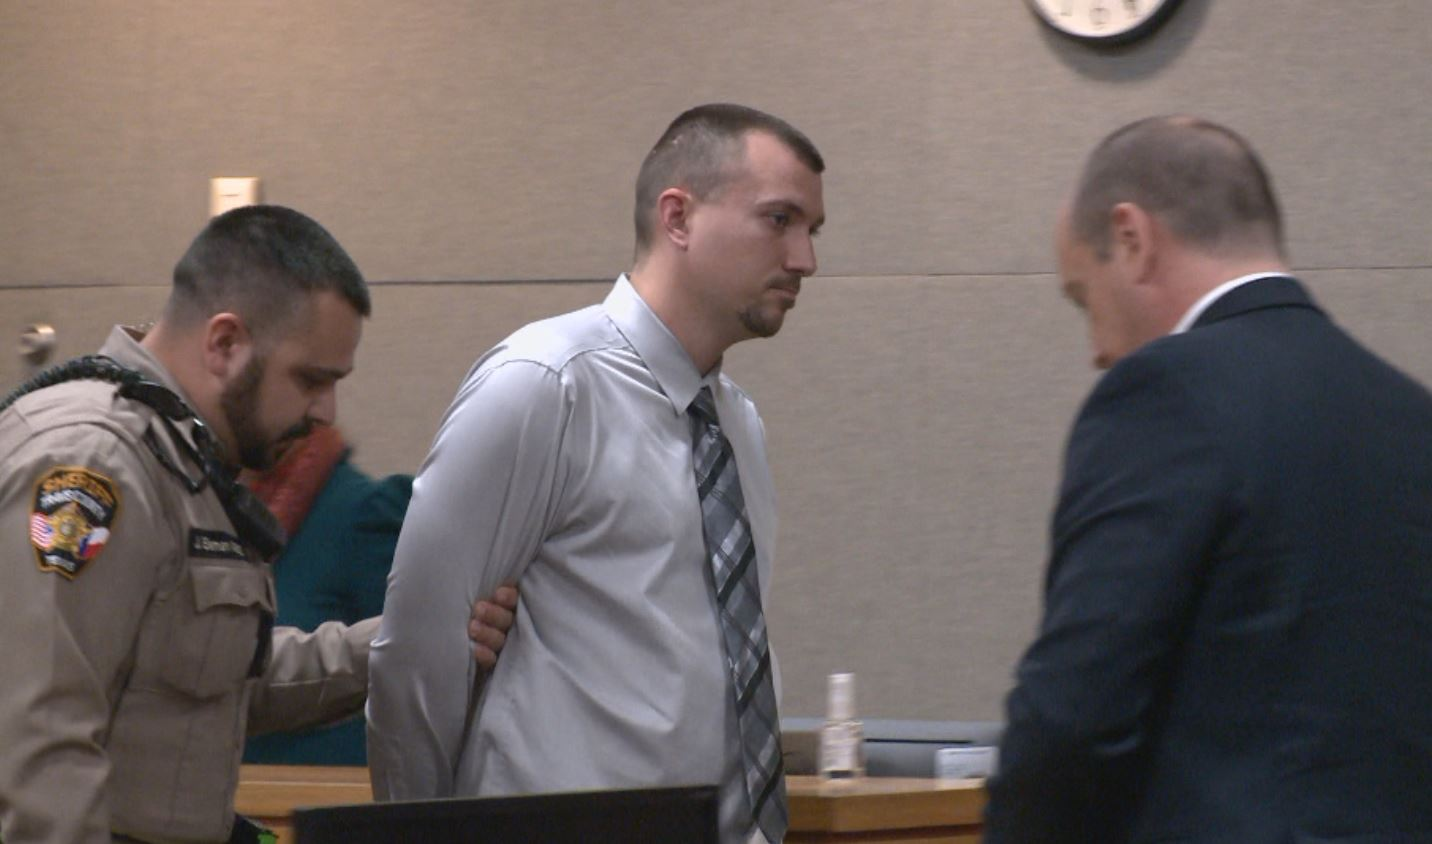 Shawn Amende taken into custody_595036